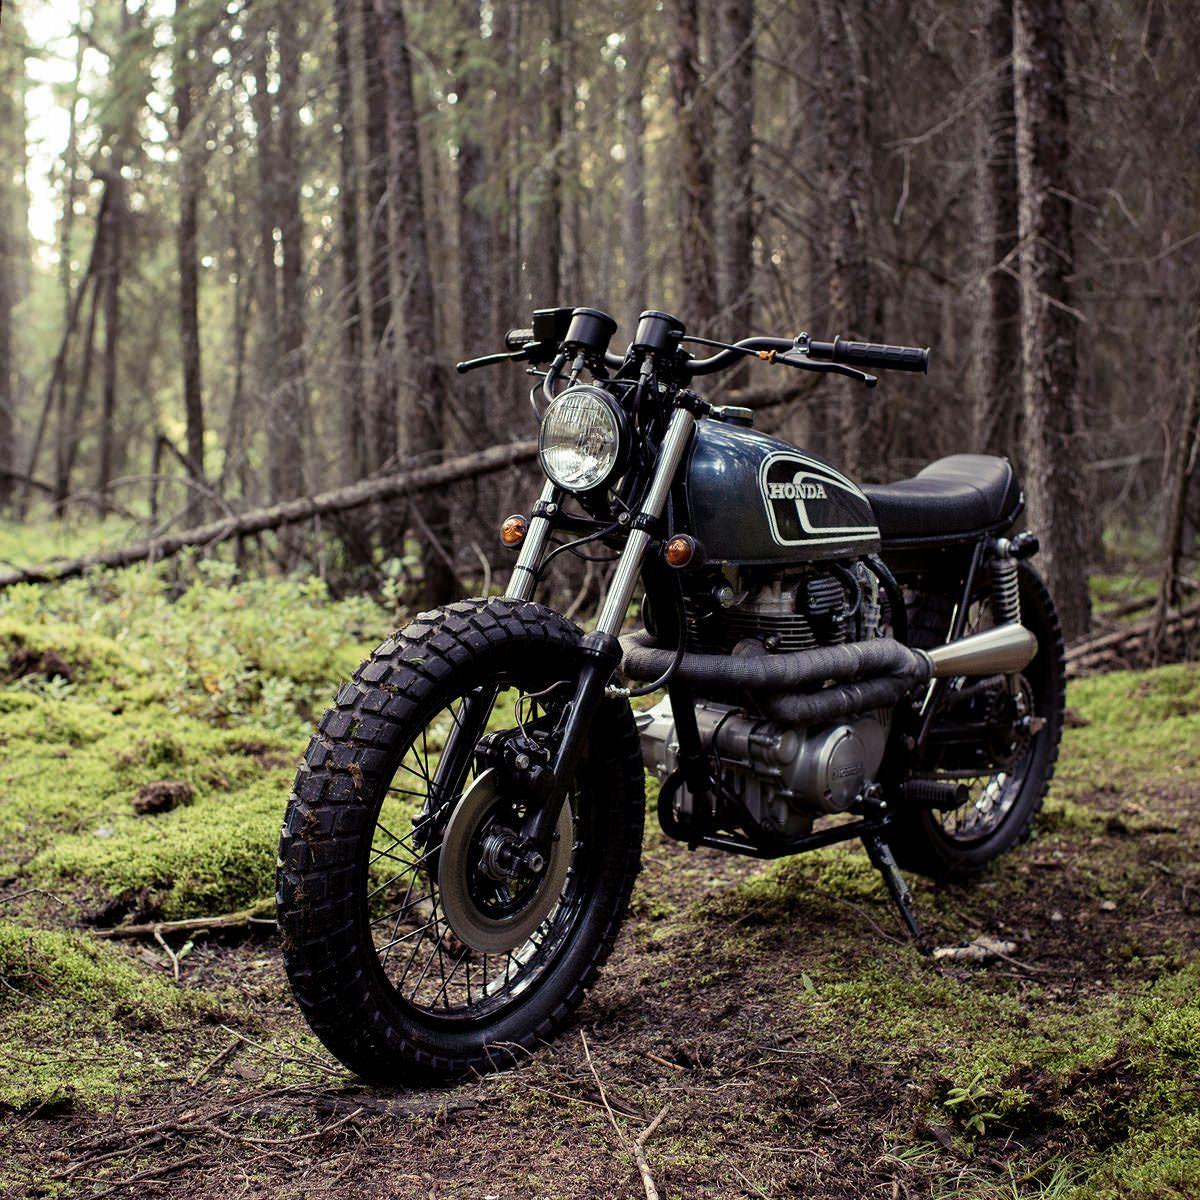 Honda CB360 by Federal Moto | Moto bike, Cool bikes, Scrambler